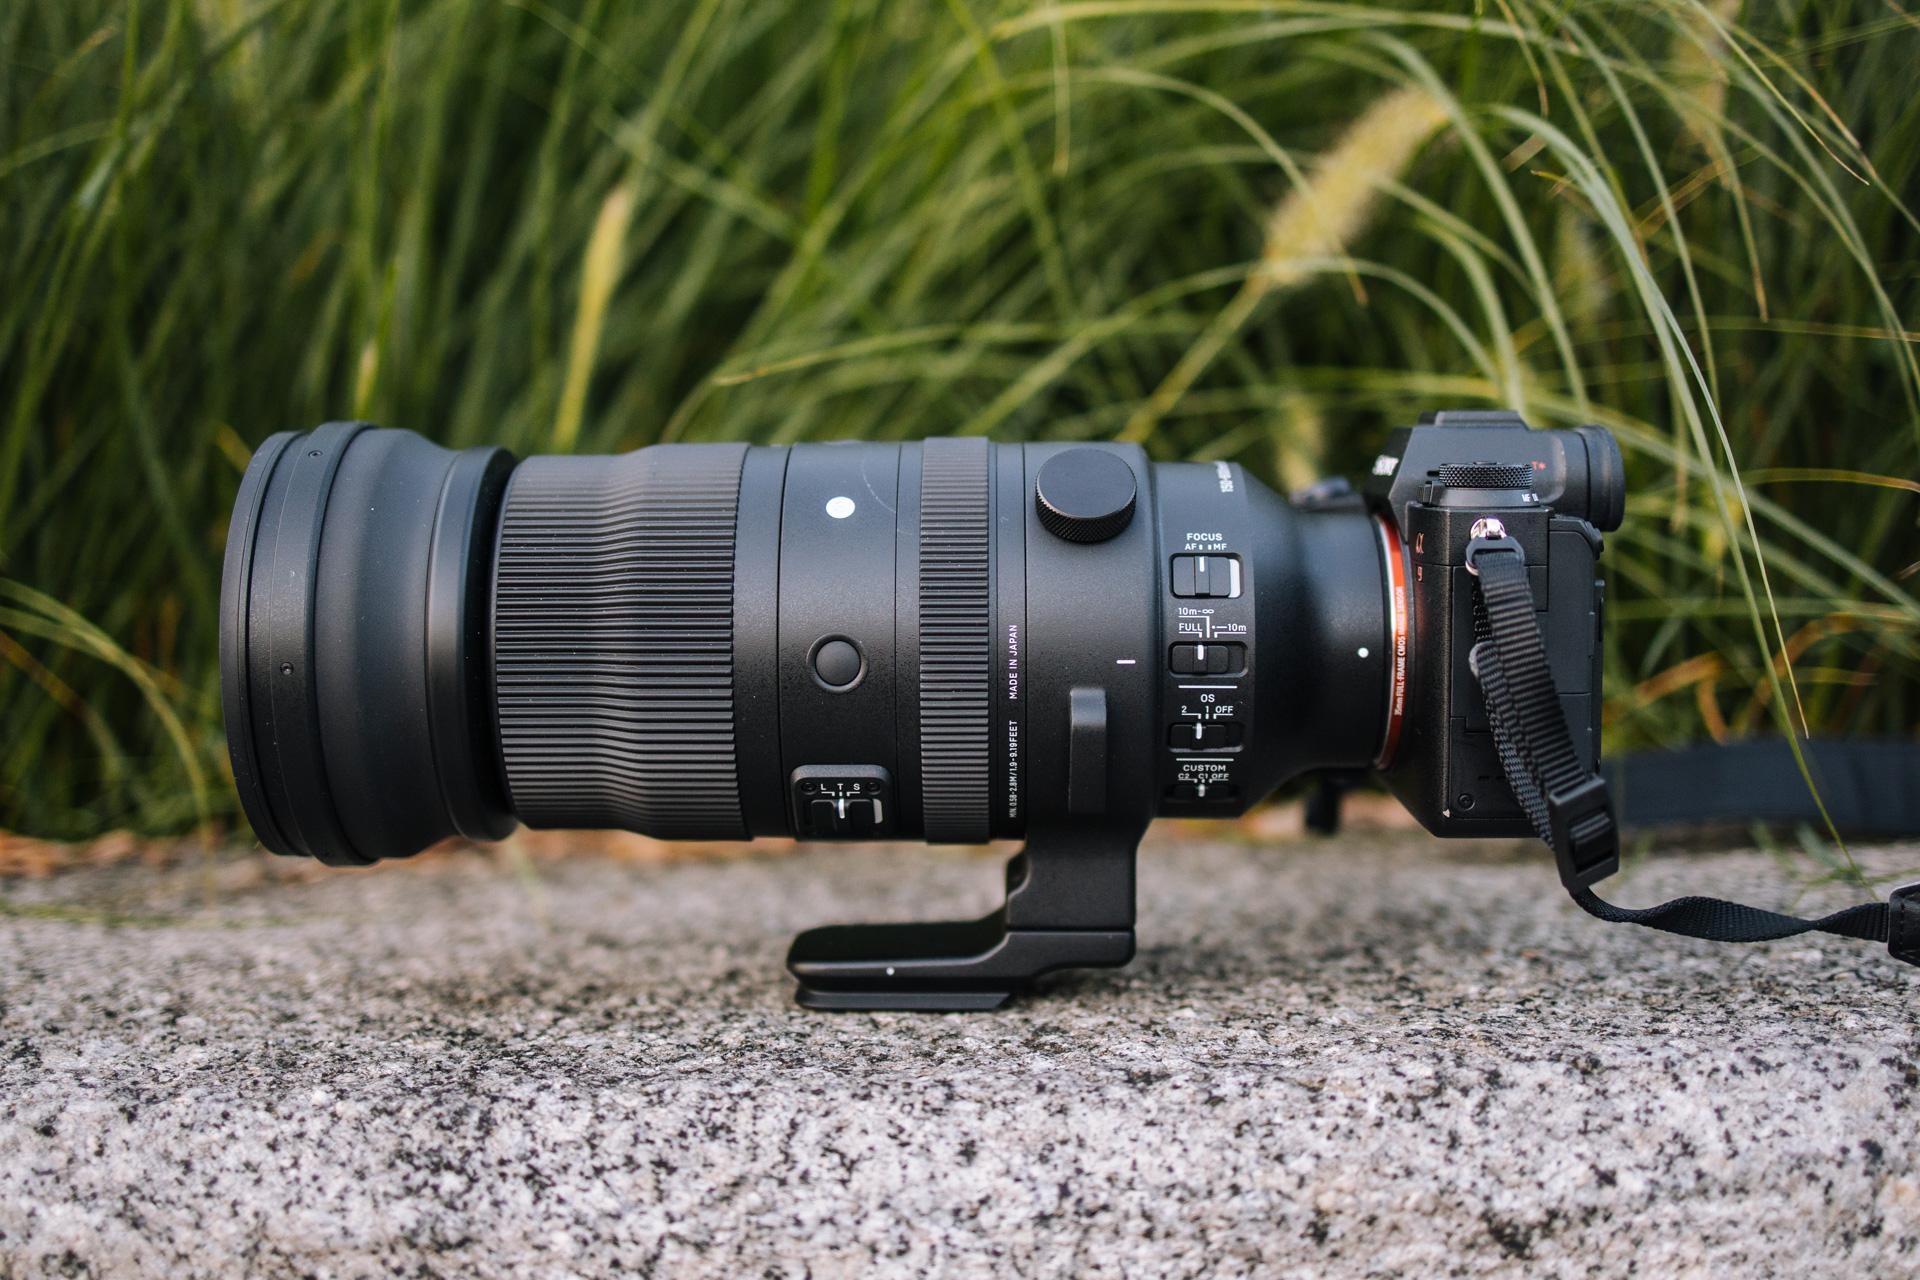 Sigma S 150-600 mm f/5-6.5 DG DN OS